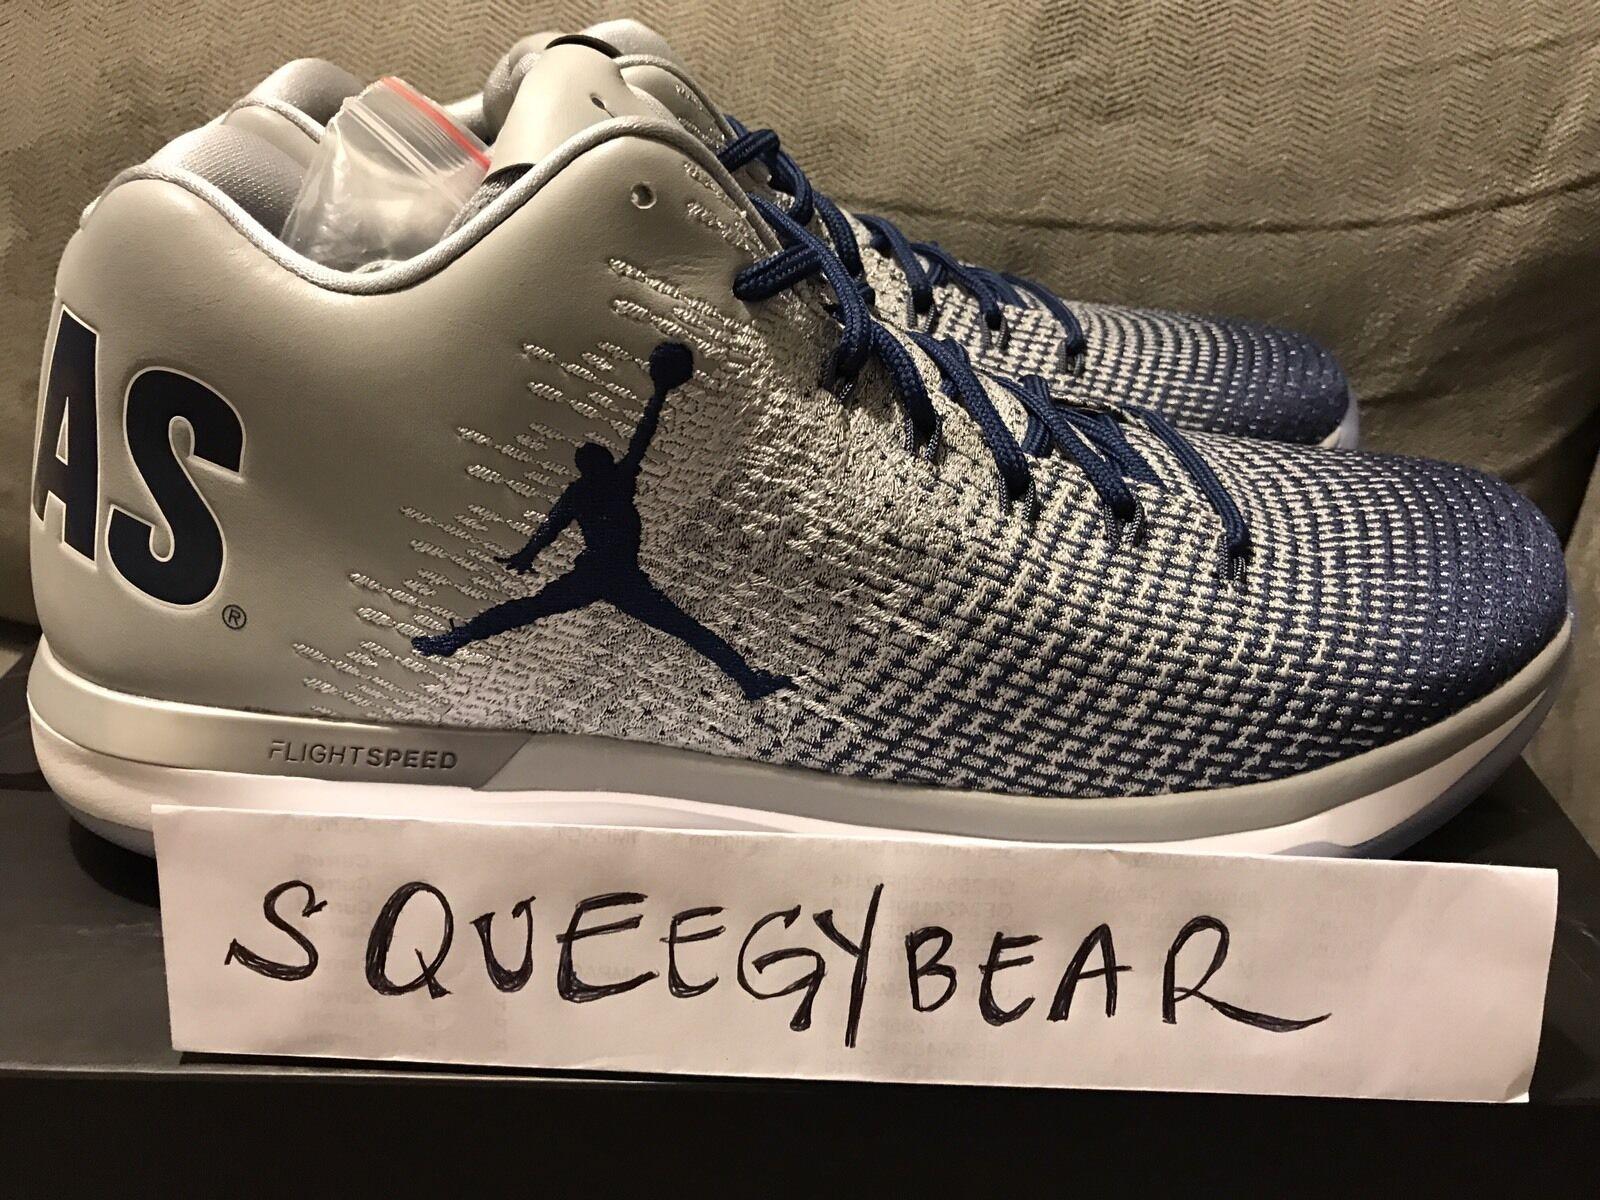 NEW Nike Air Jordan XXXI 31 Low Georgetown Hoyas Grey Navy Comfortable Cheap and beautiful fashion